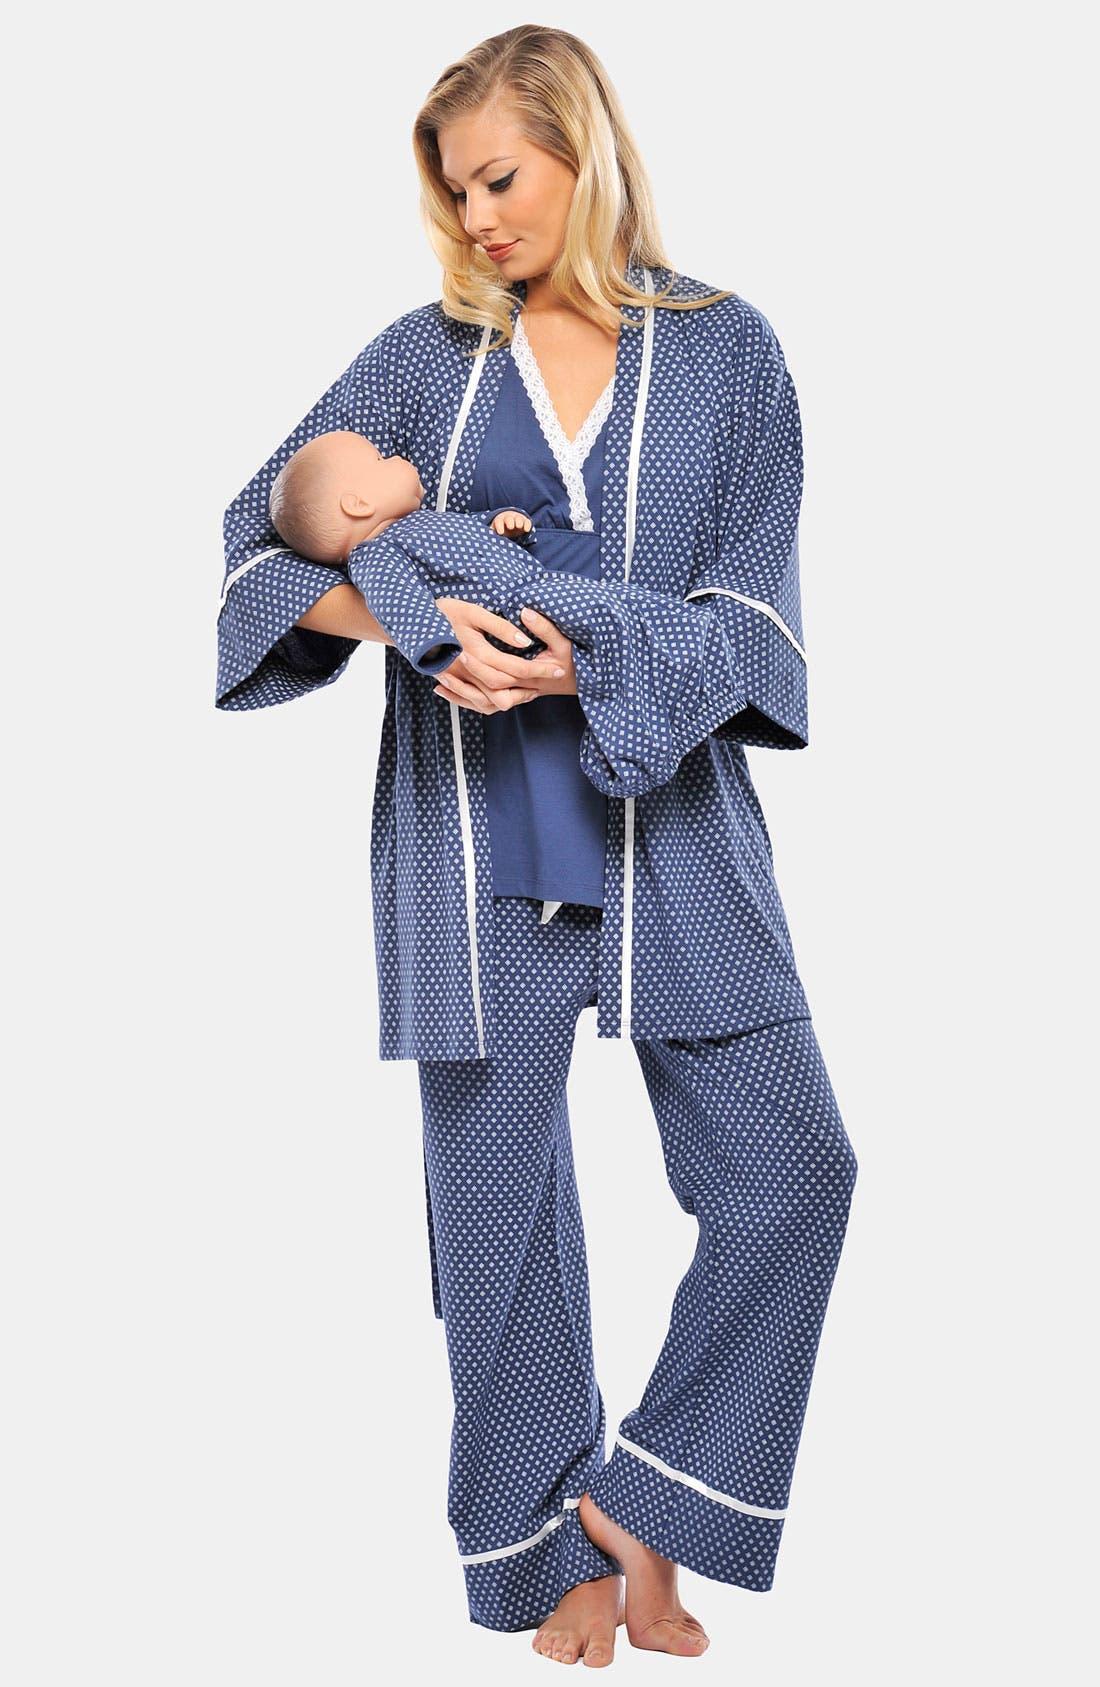 Main Image - Olian 'Lila' Print Peplum Maternity Top